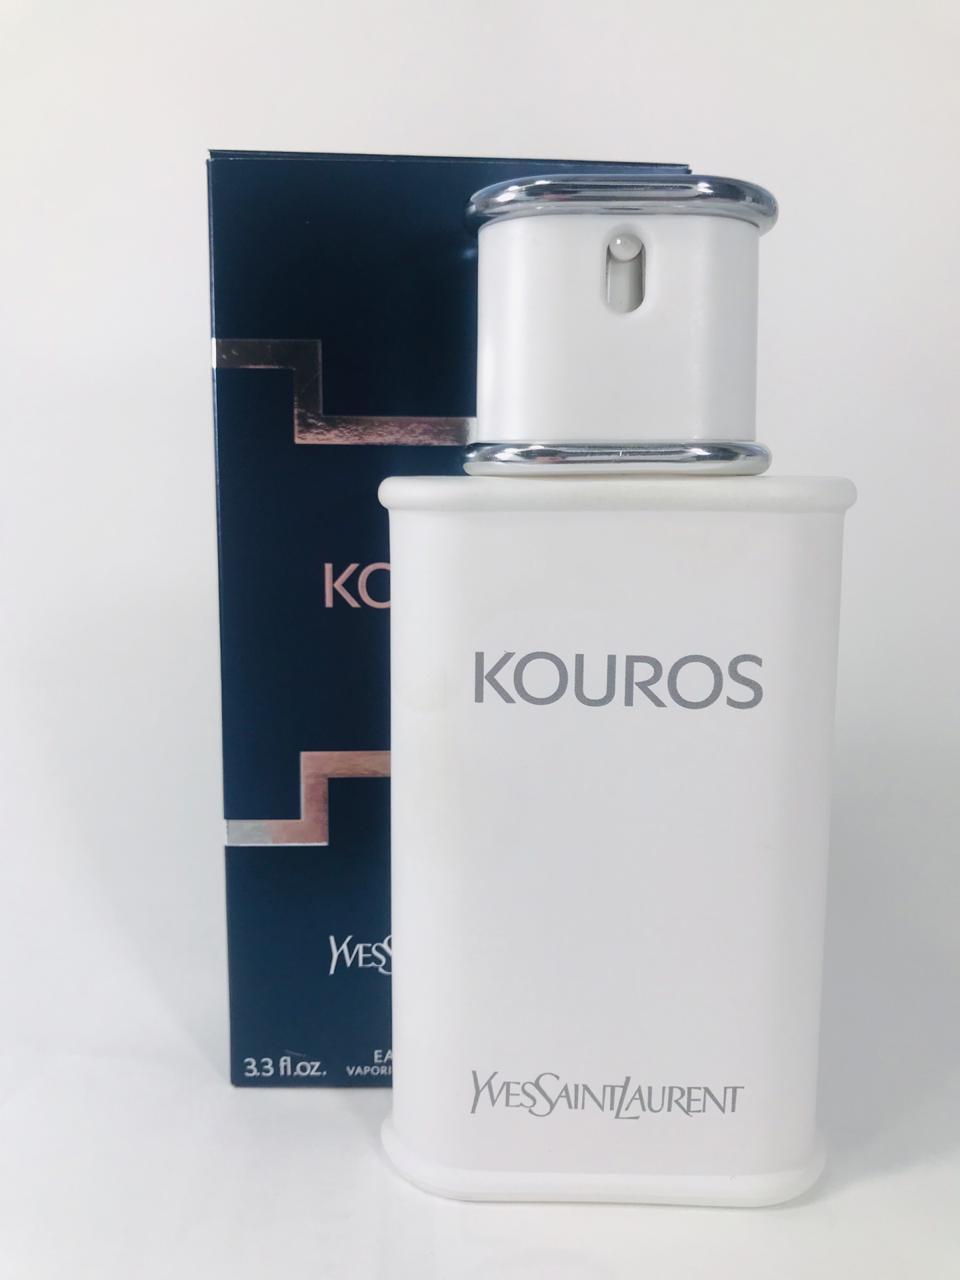 Kouros Yves Saint Laurent Masculino Eau de Toilette 100ML - Tester